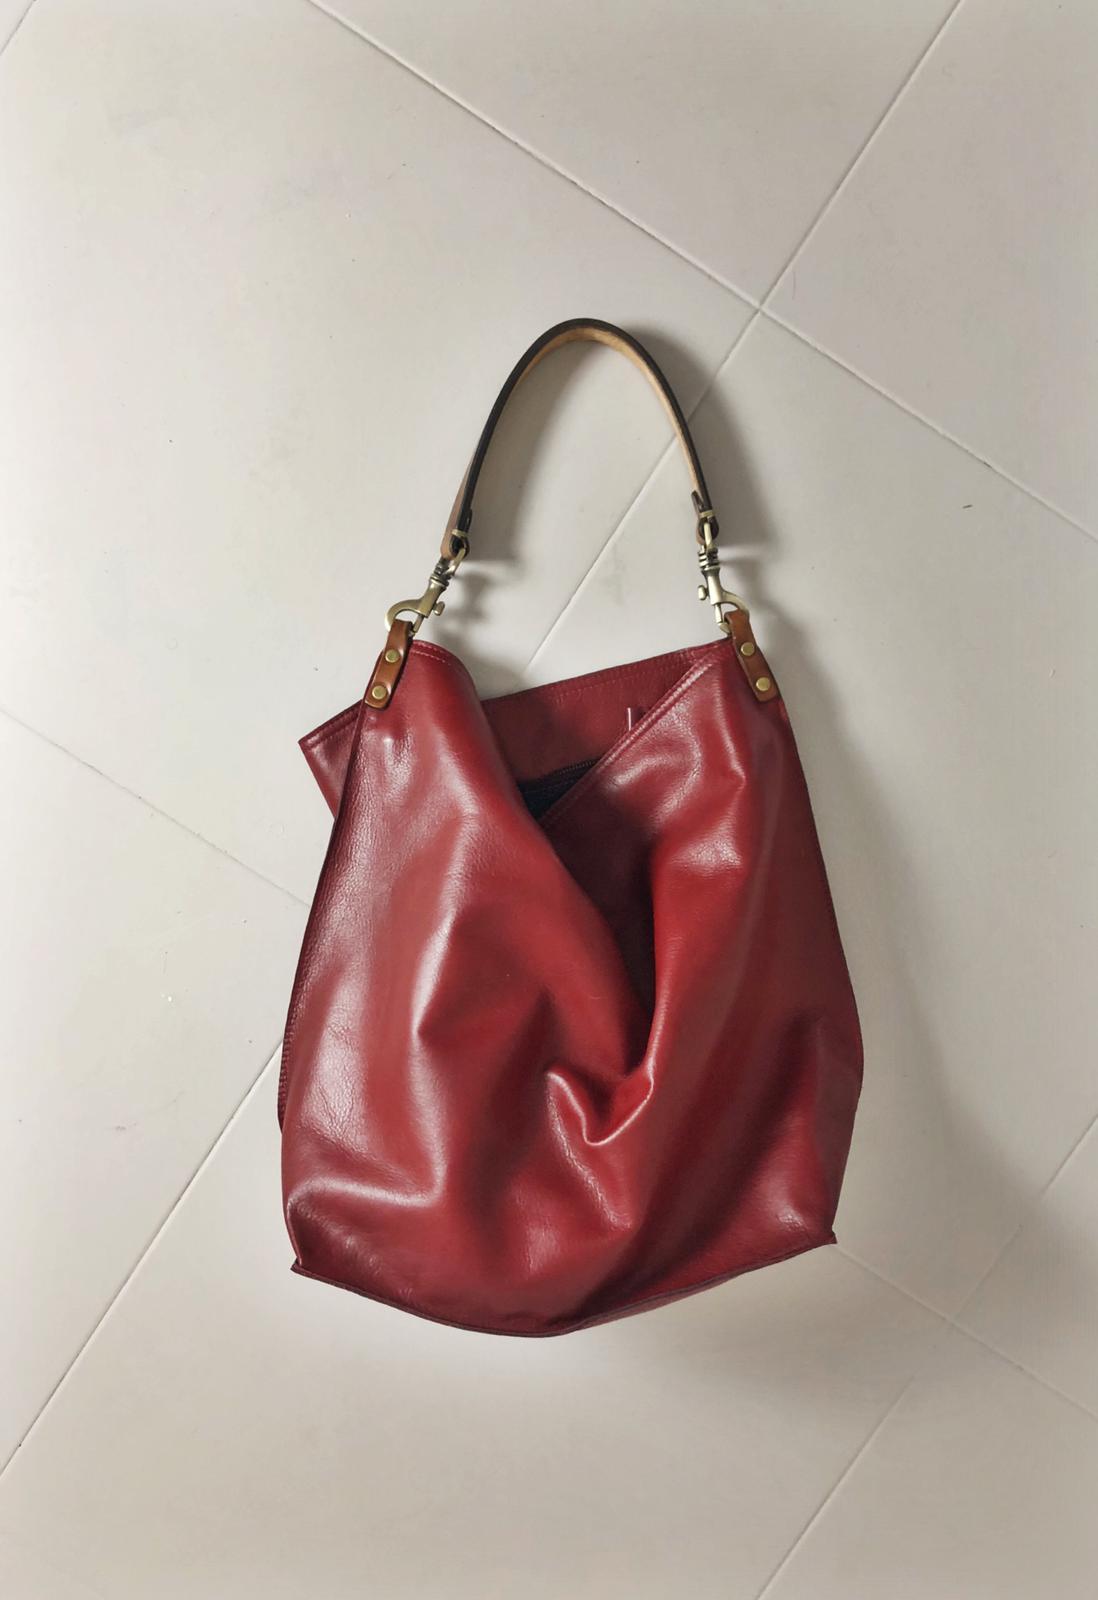 ALLEGRA BAG handmade leather bag image 5